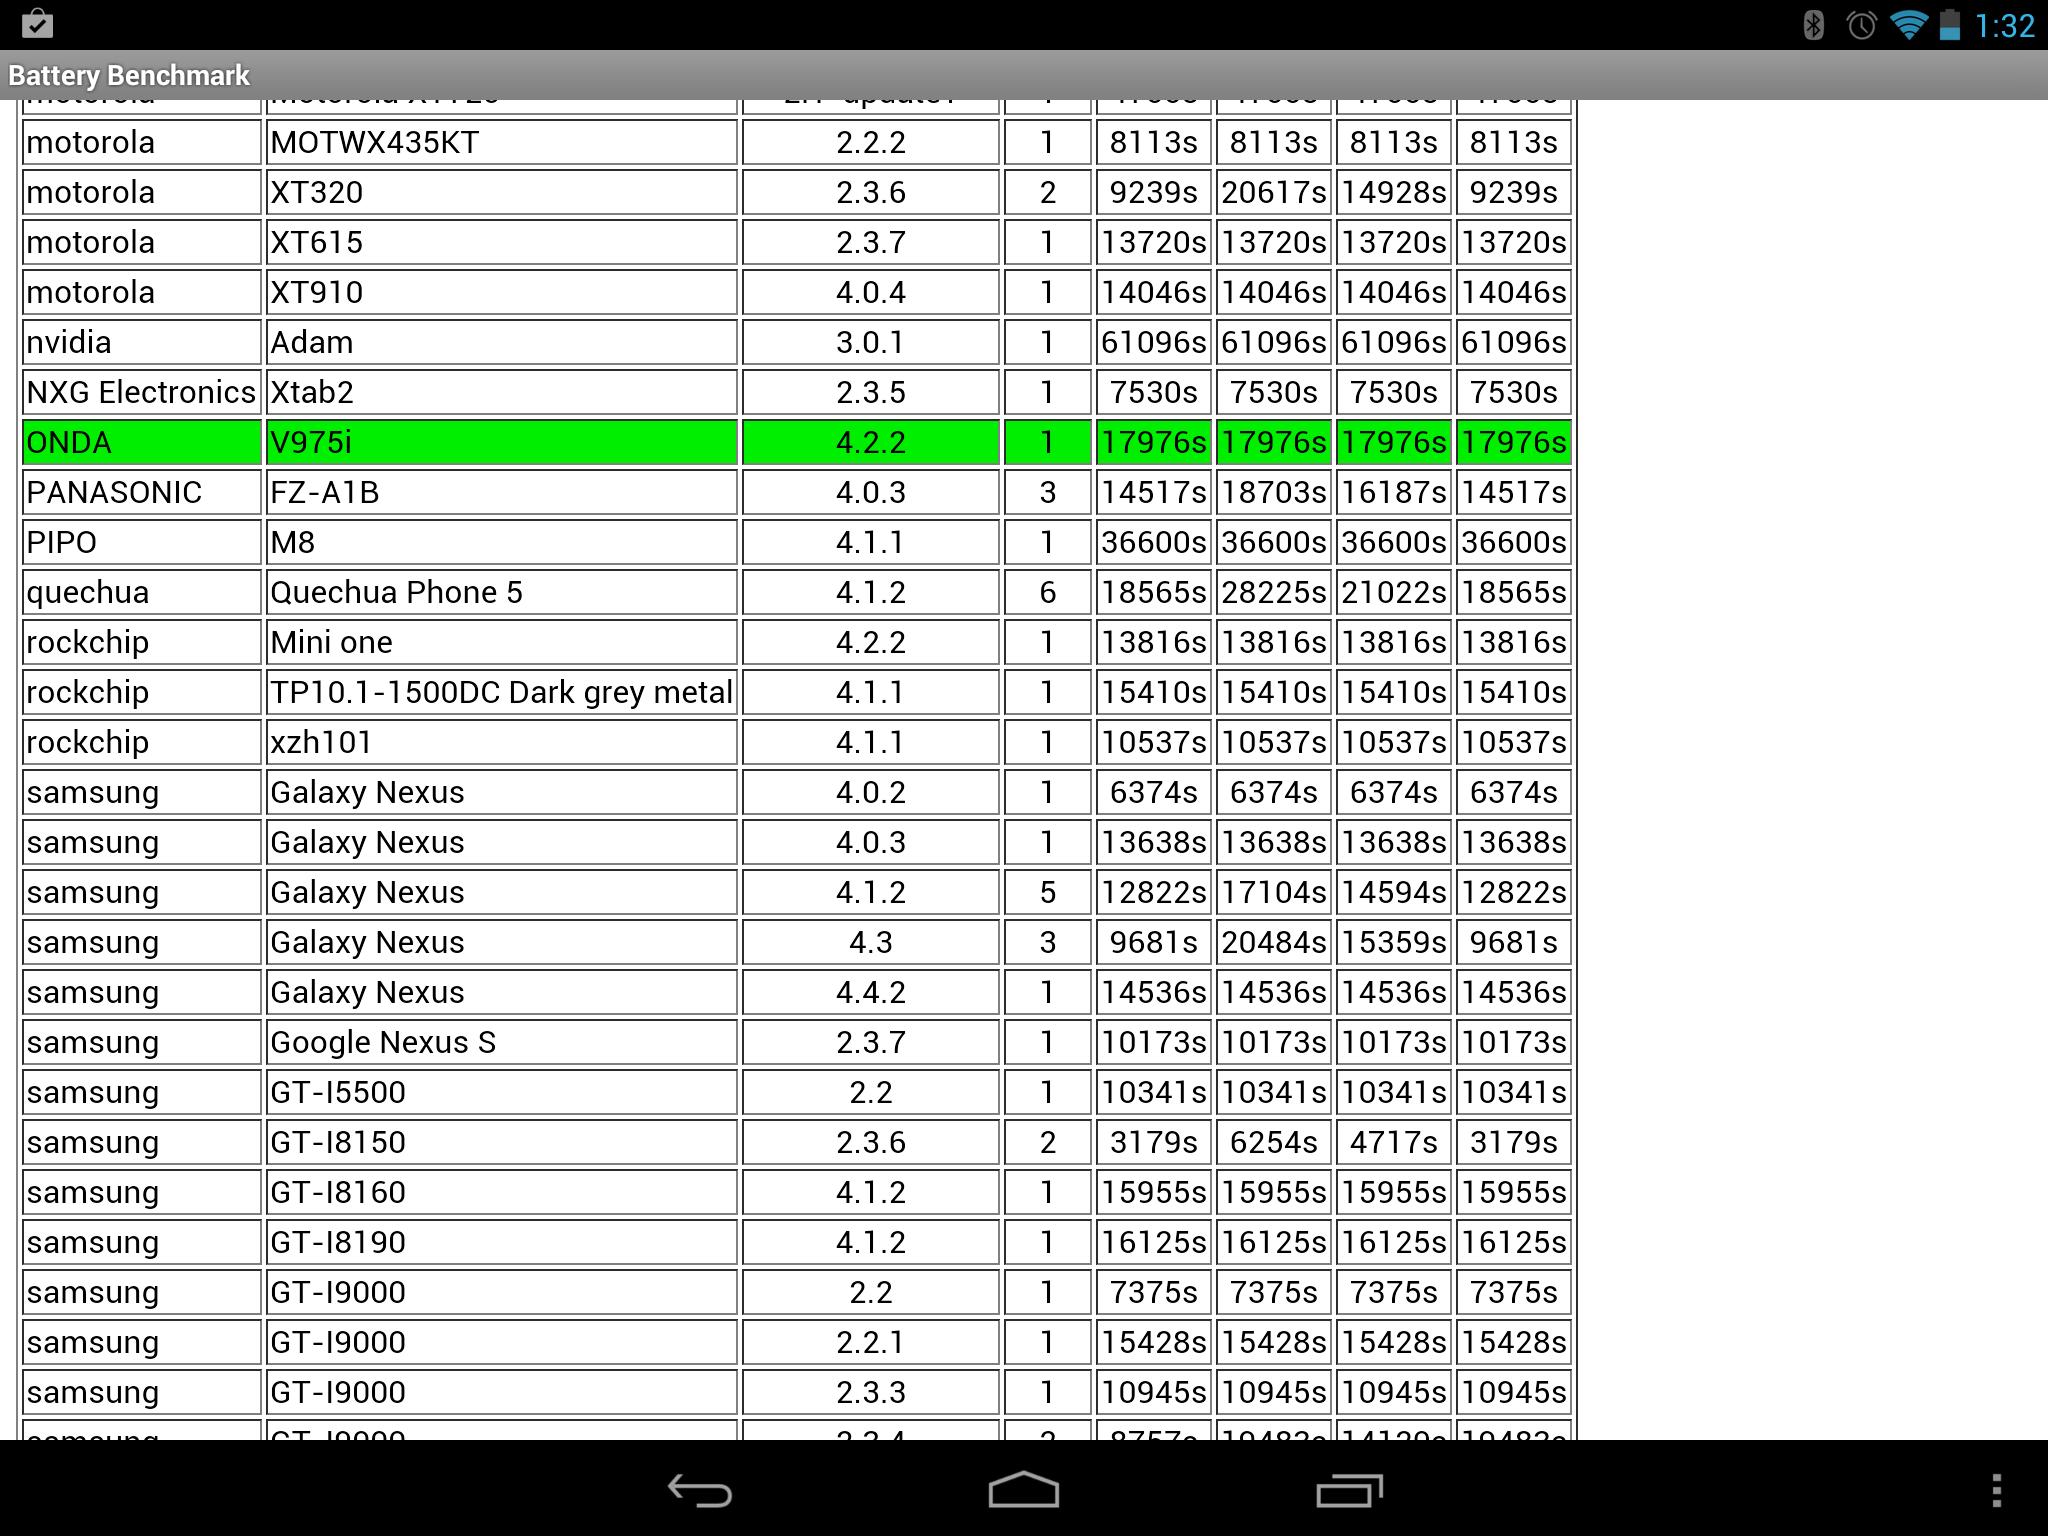 Screenshot_2014-06-24-01-32-49.png